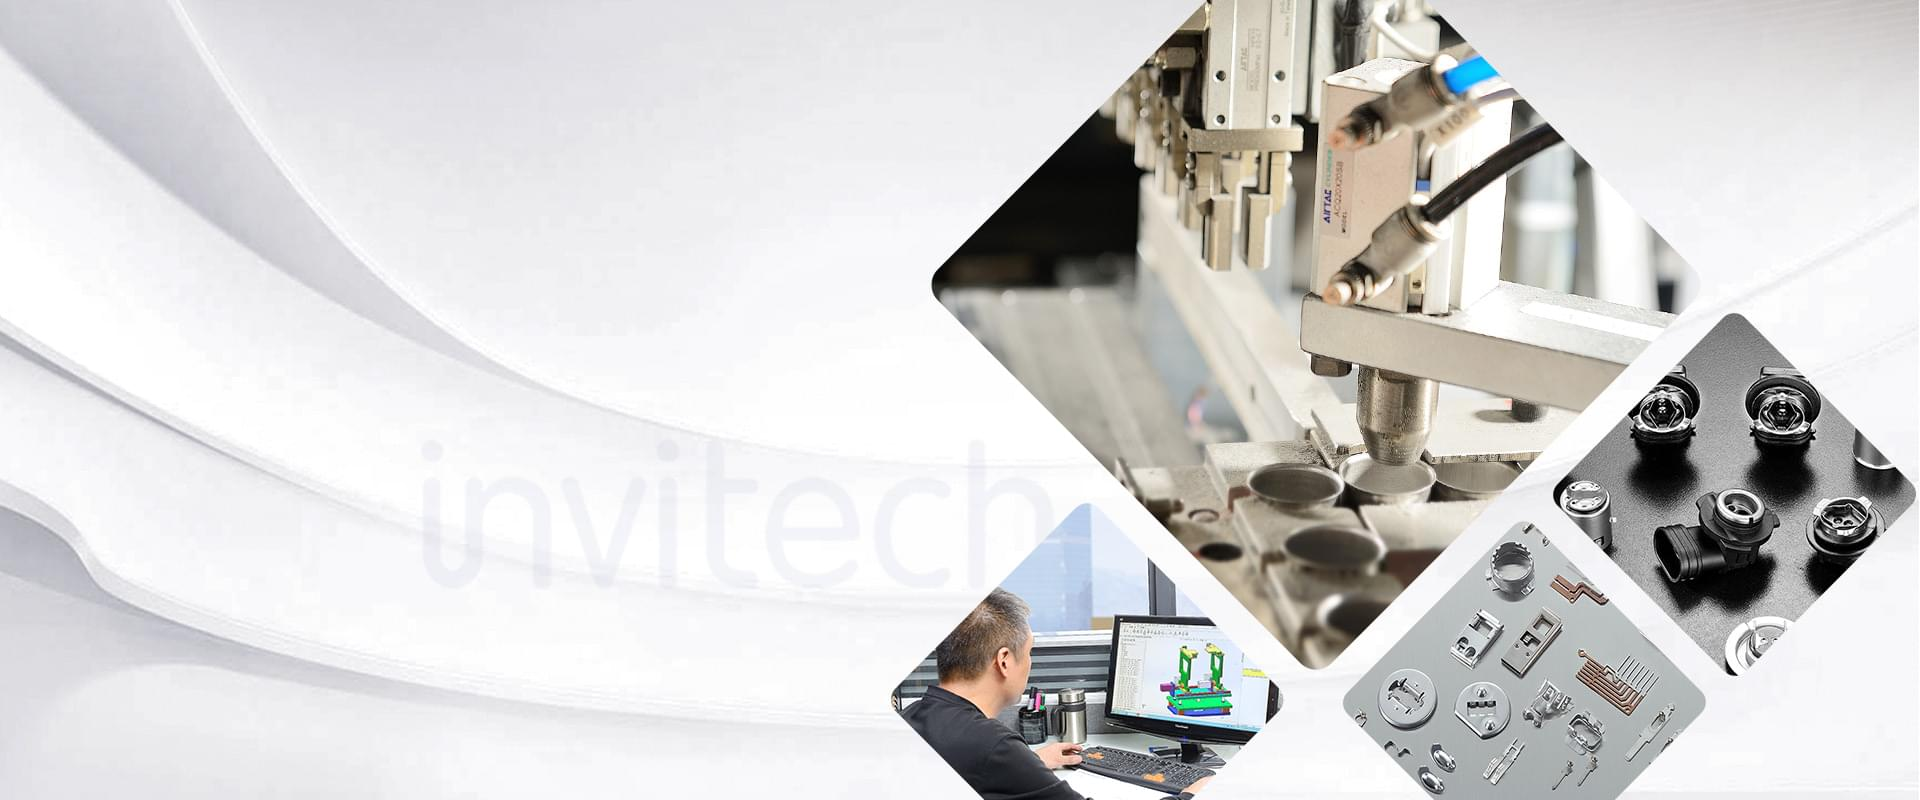 Micron-level precision customization